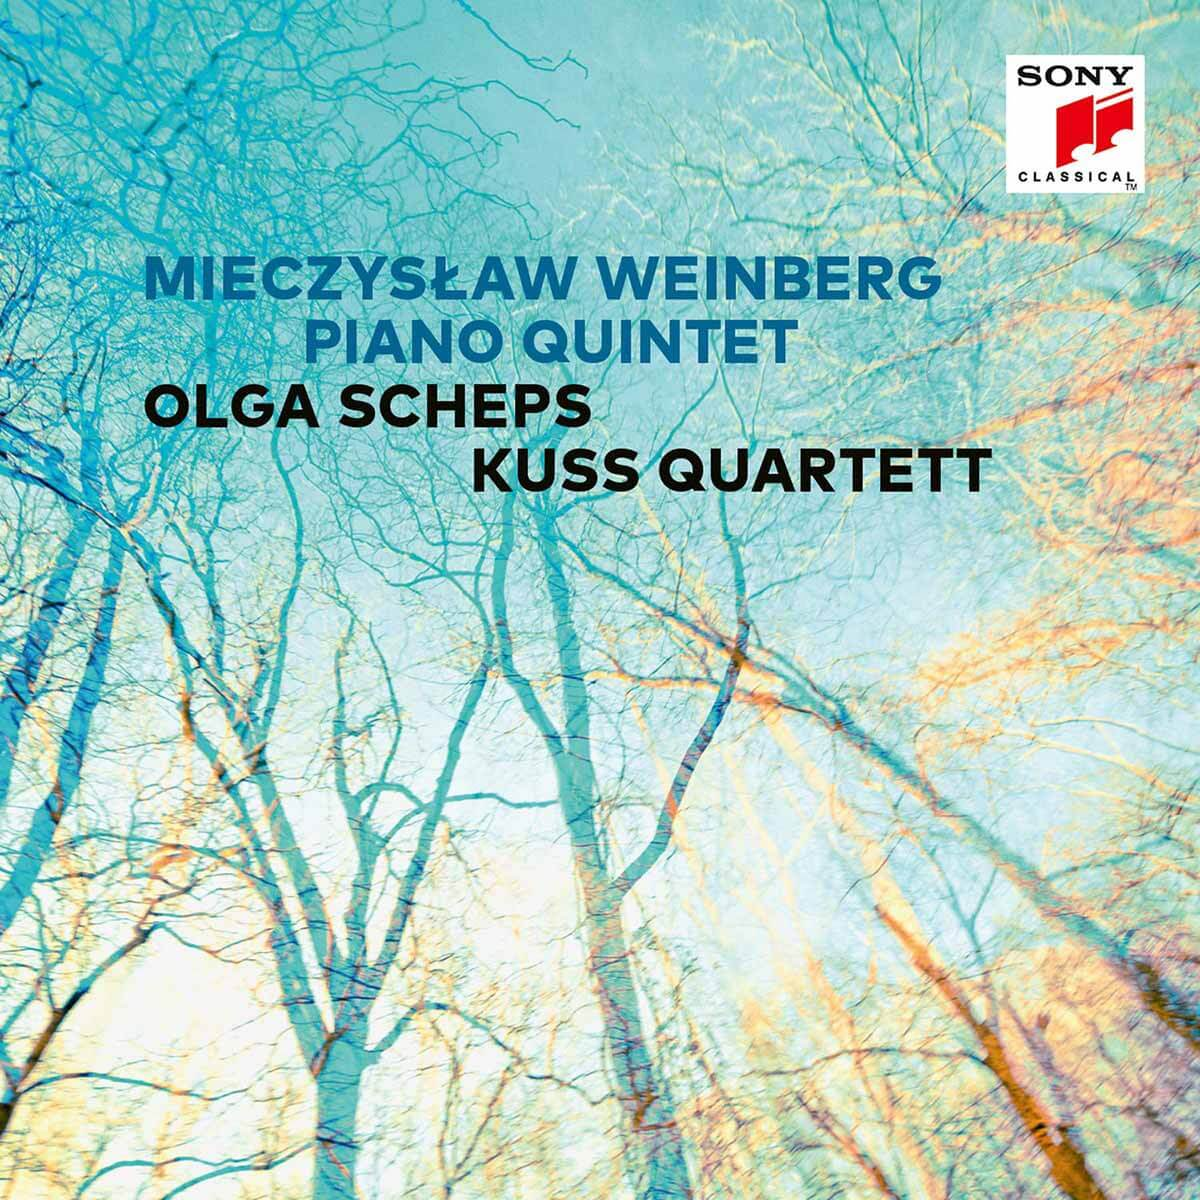 Mieczyslaw Weinberg: Piano Quintet